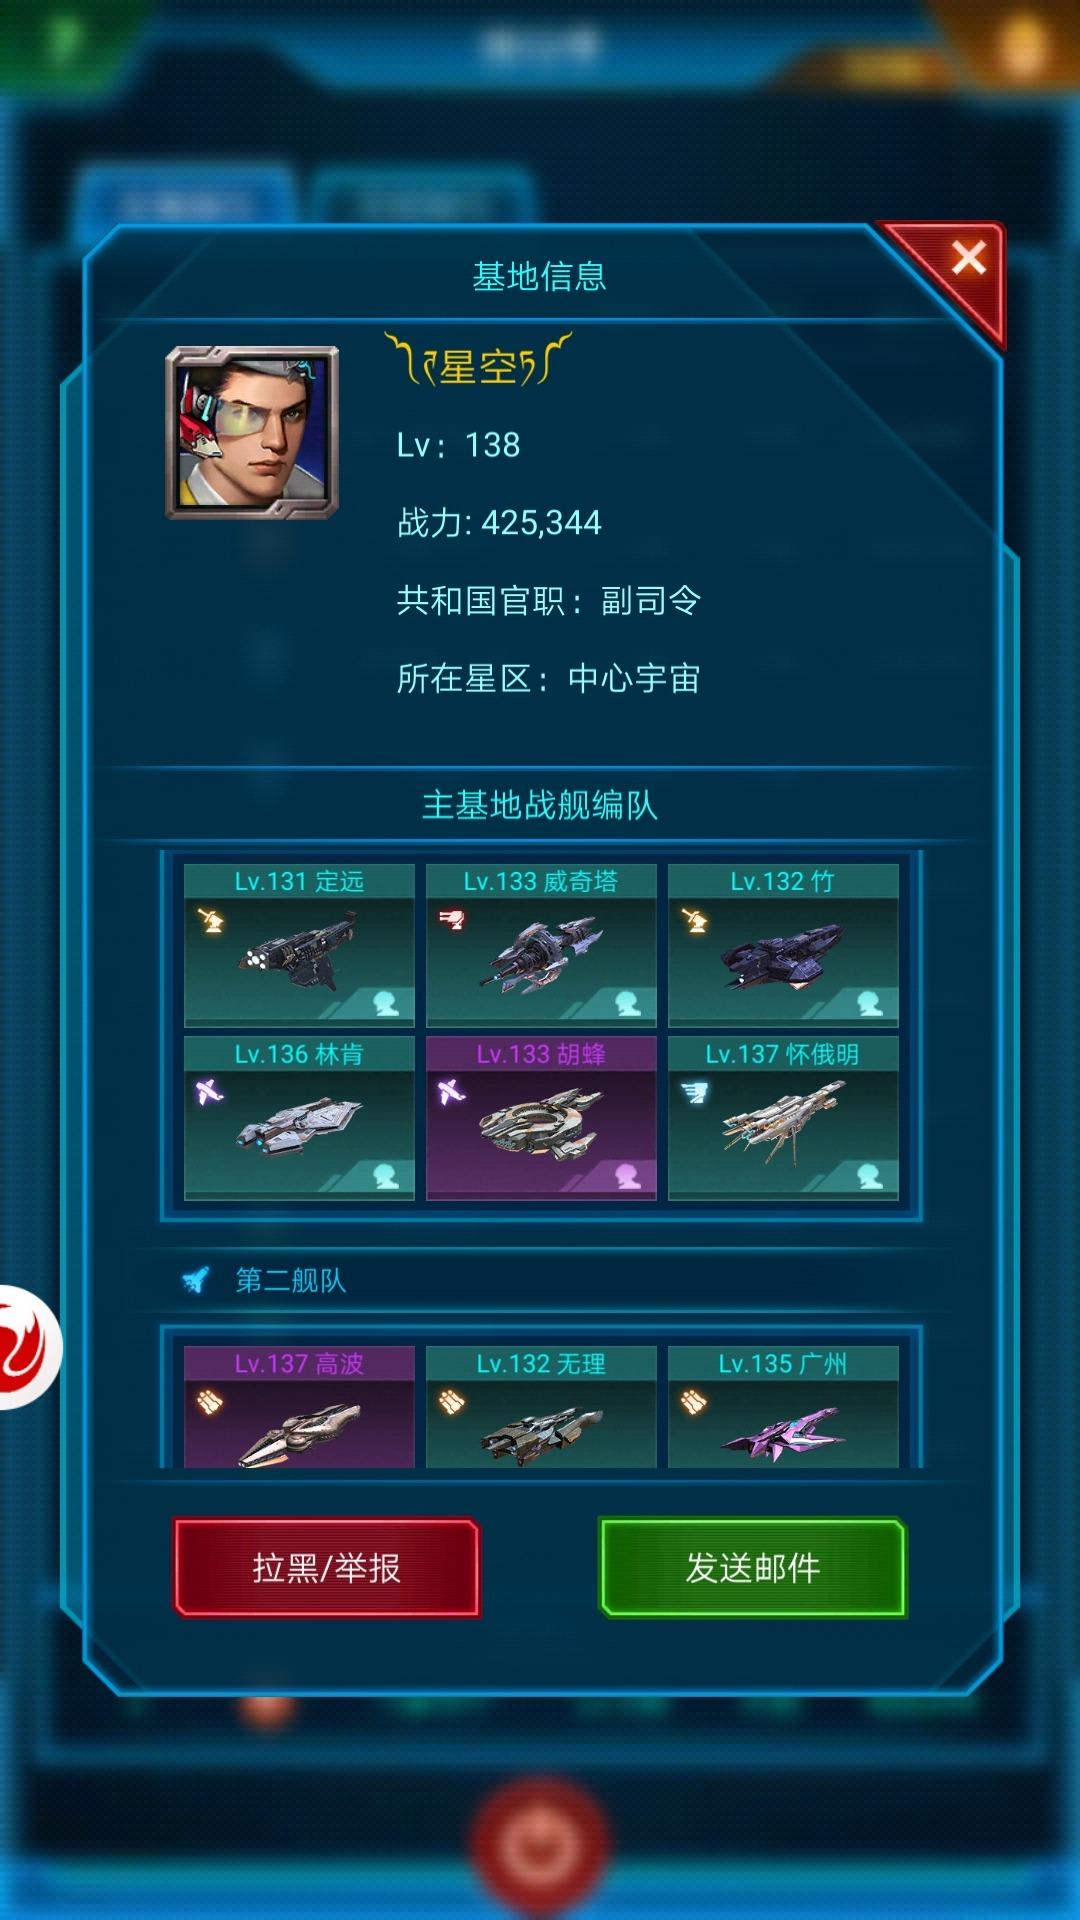 Screenshot_20190827_224850_com.jedigames.p16s.luobo.jpg